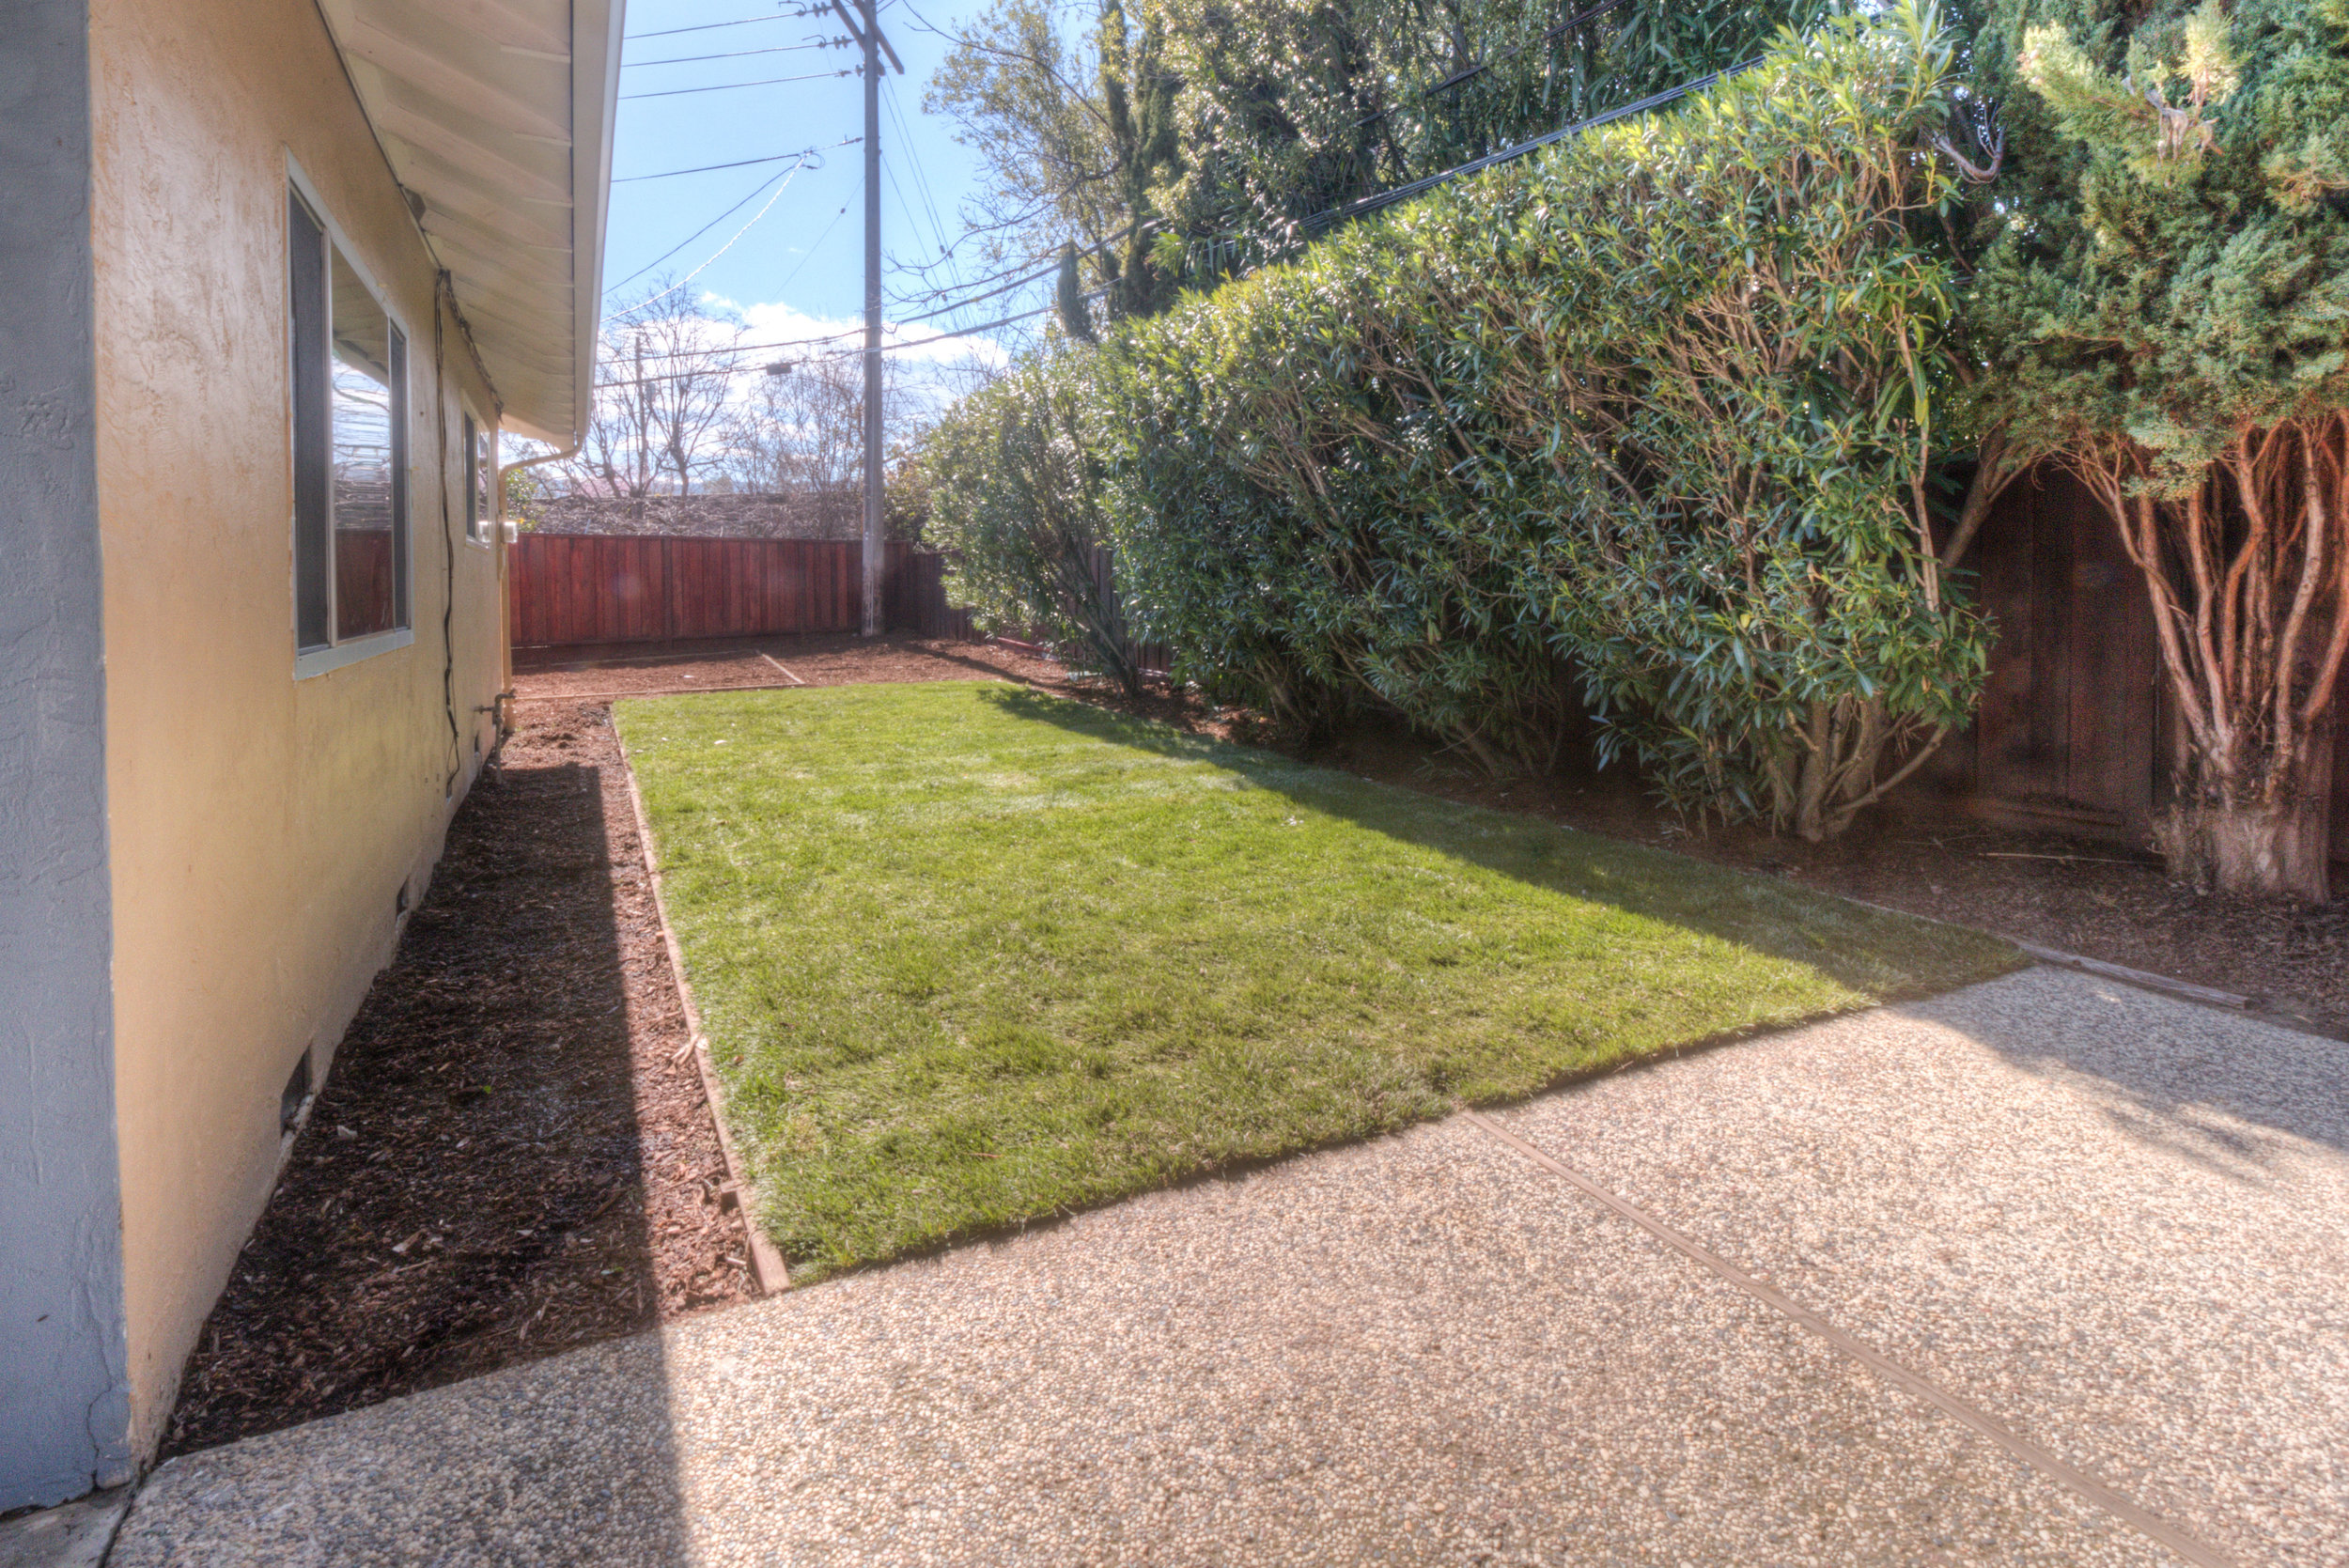 Mcgregor Backyard Revised-1.jpg